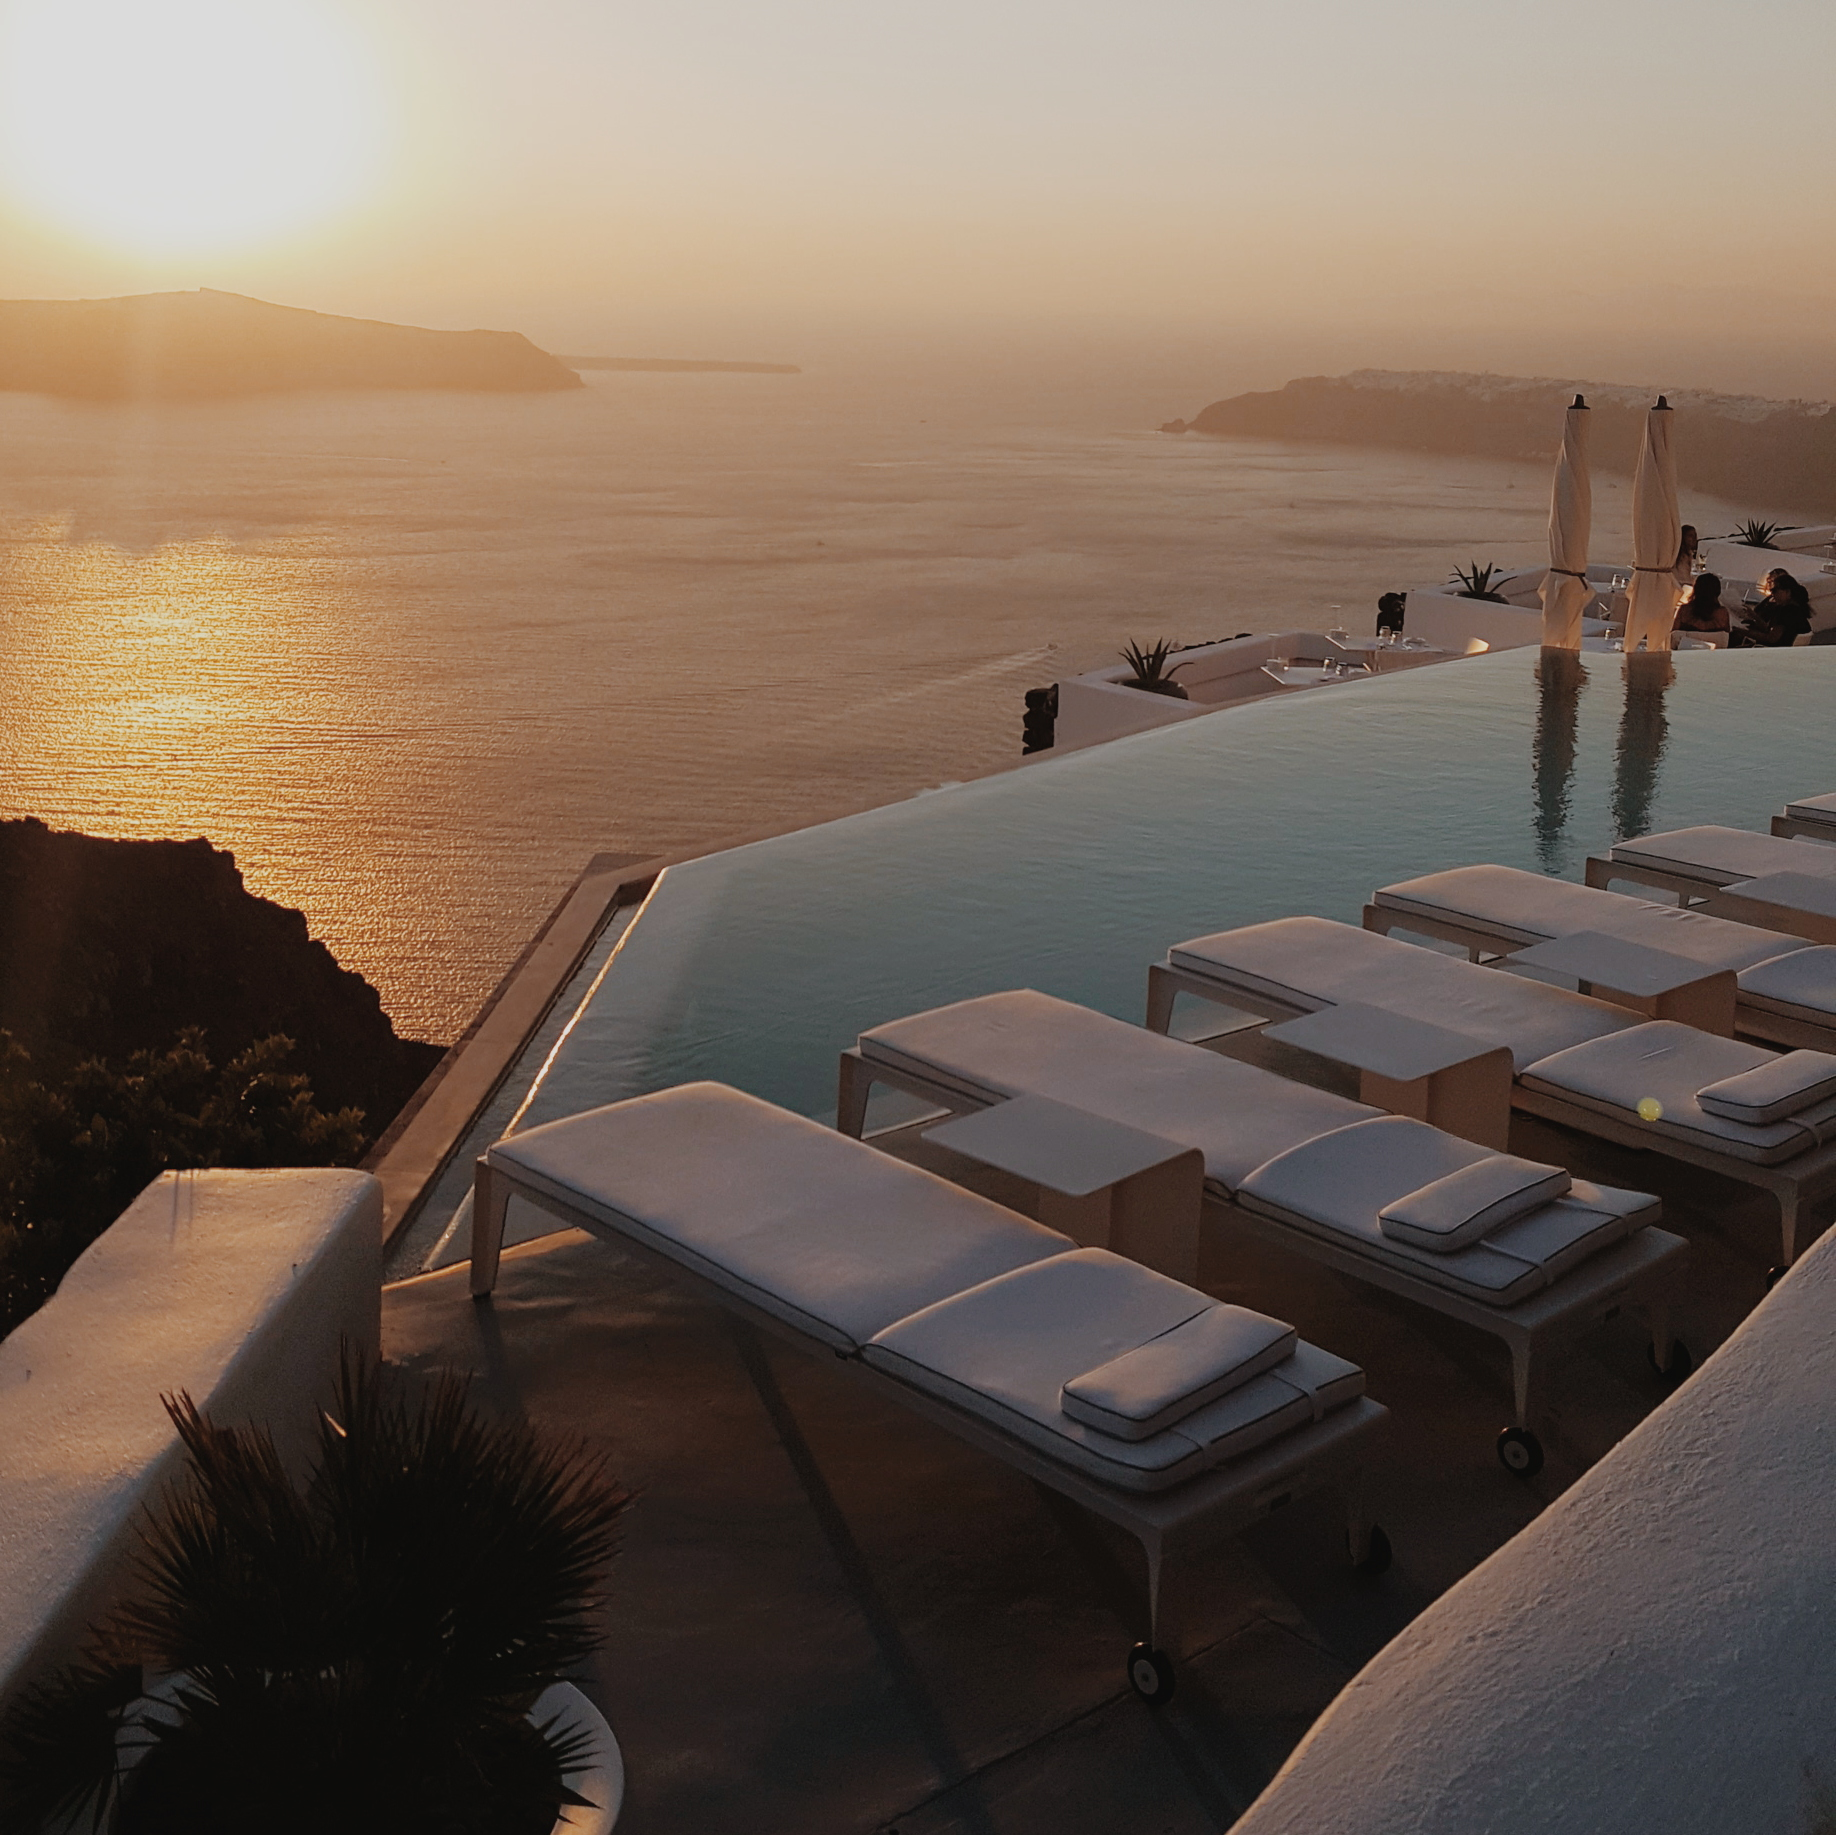 caldera hotel view.jpg